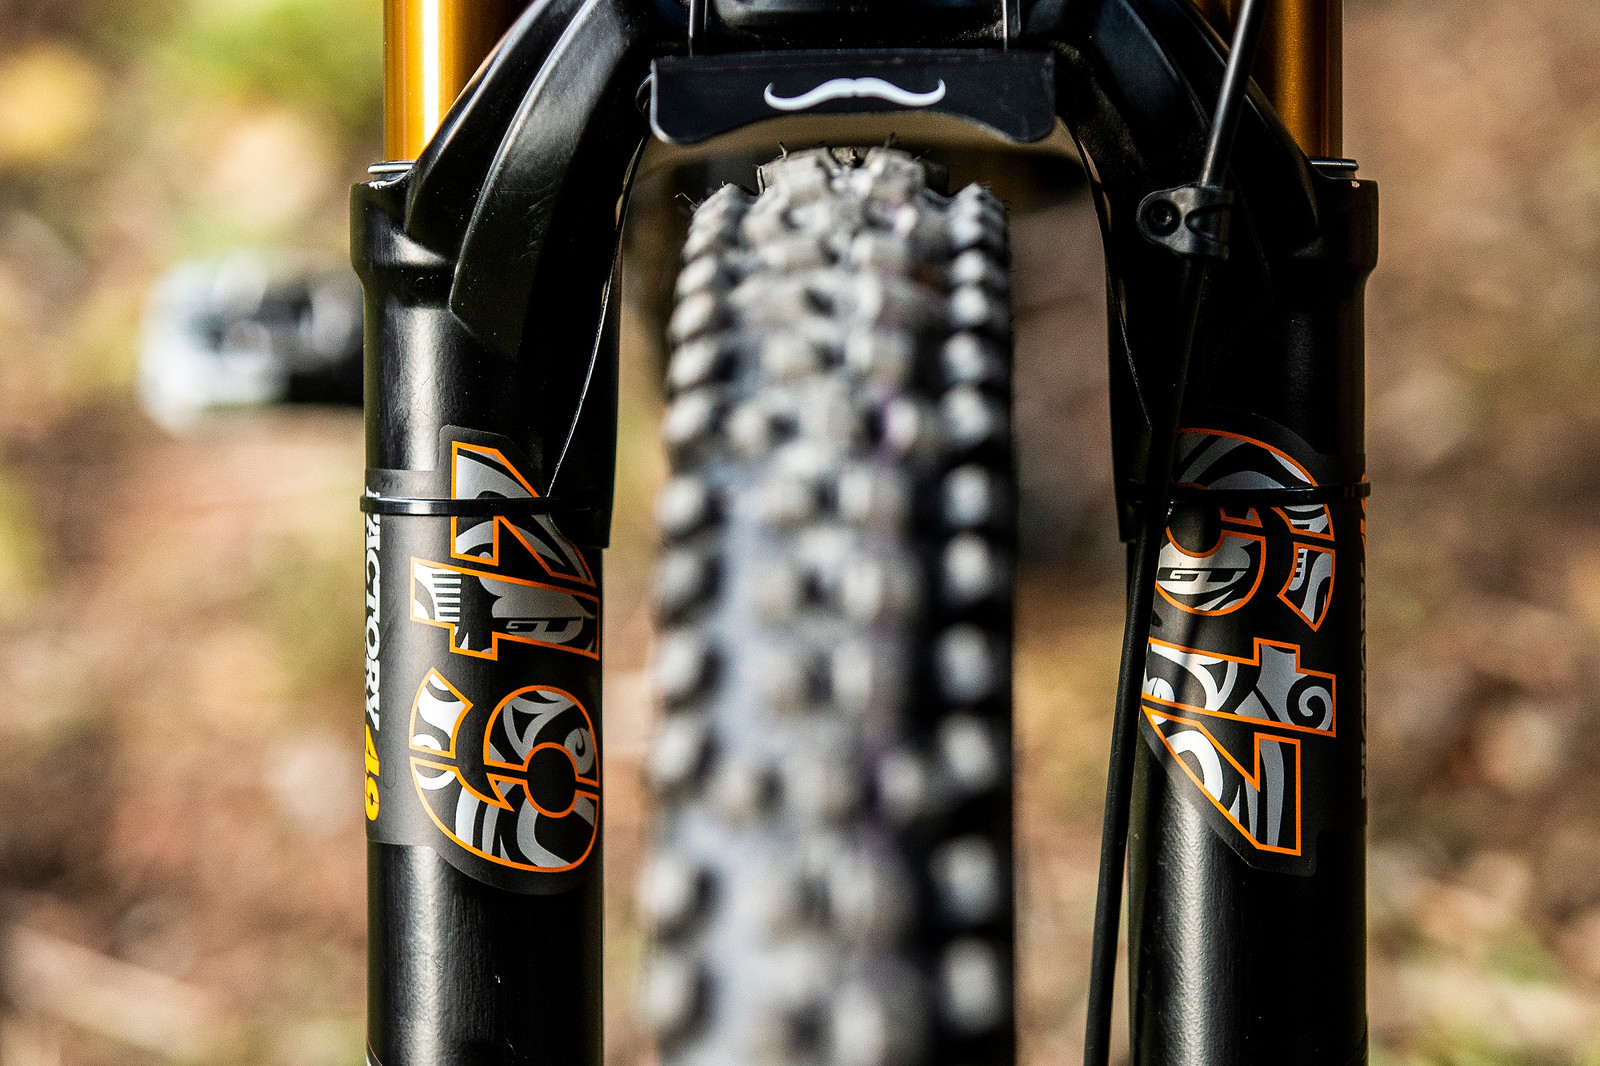 A Touch of Orange - WORLD CHAMPS BIKE - Wyn Masters' GT Fury - Mountain Biking Pictures - Vital MTB